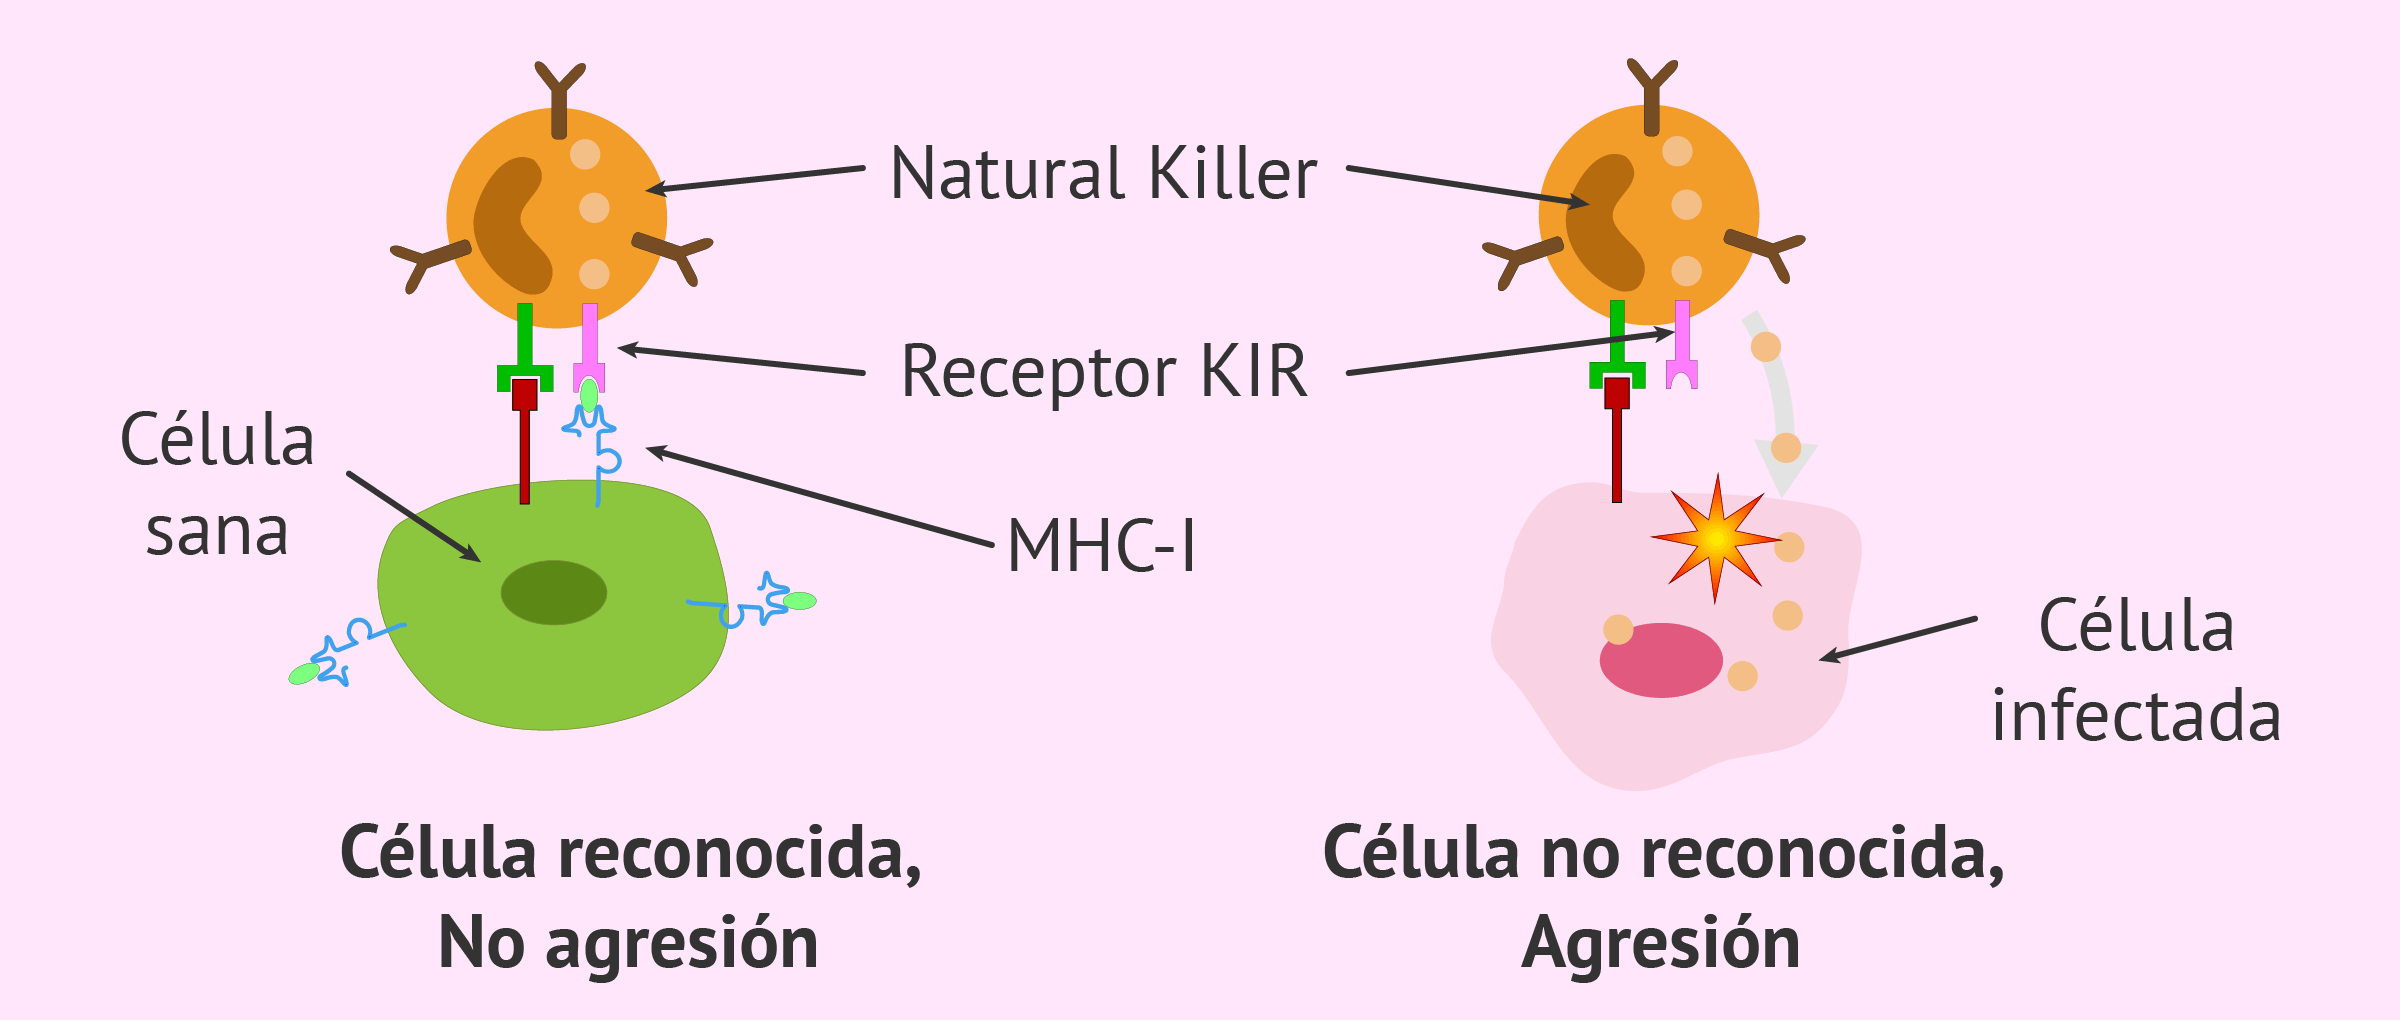 Función de las células Natural Killer